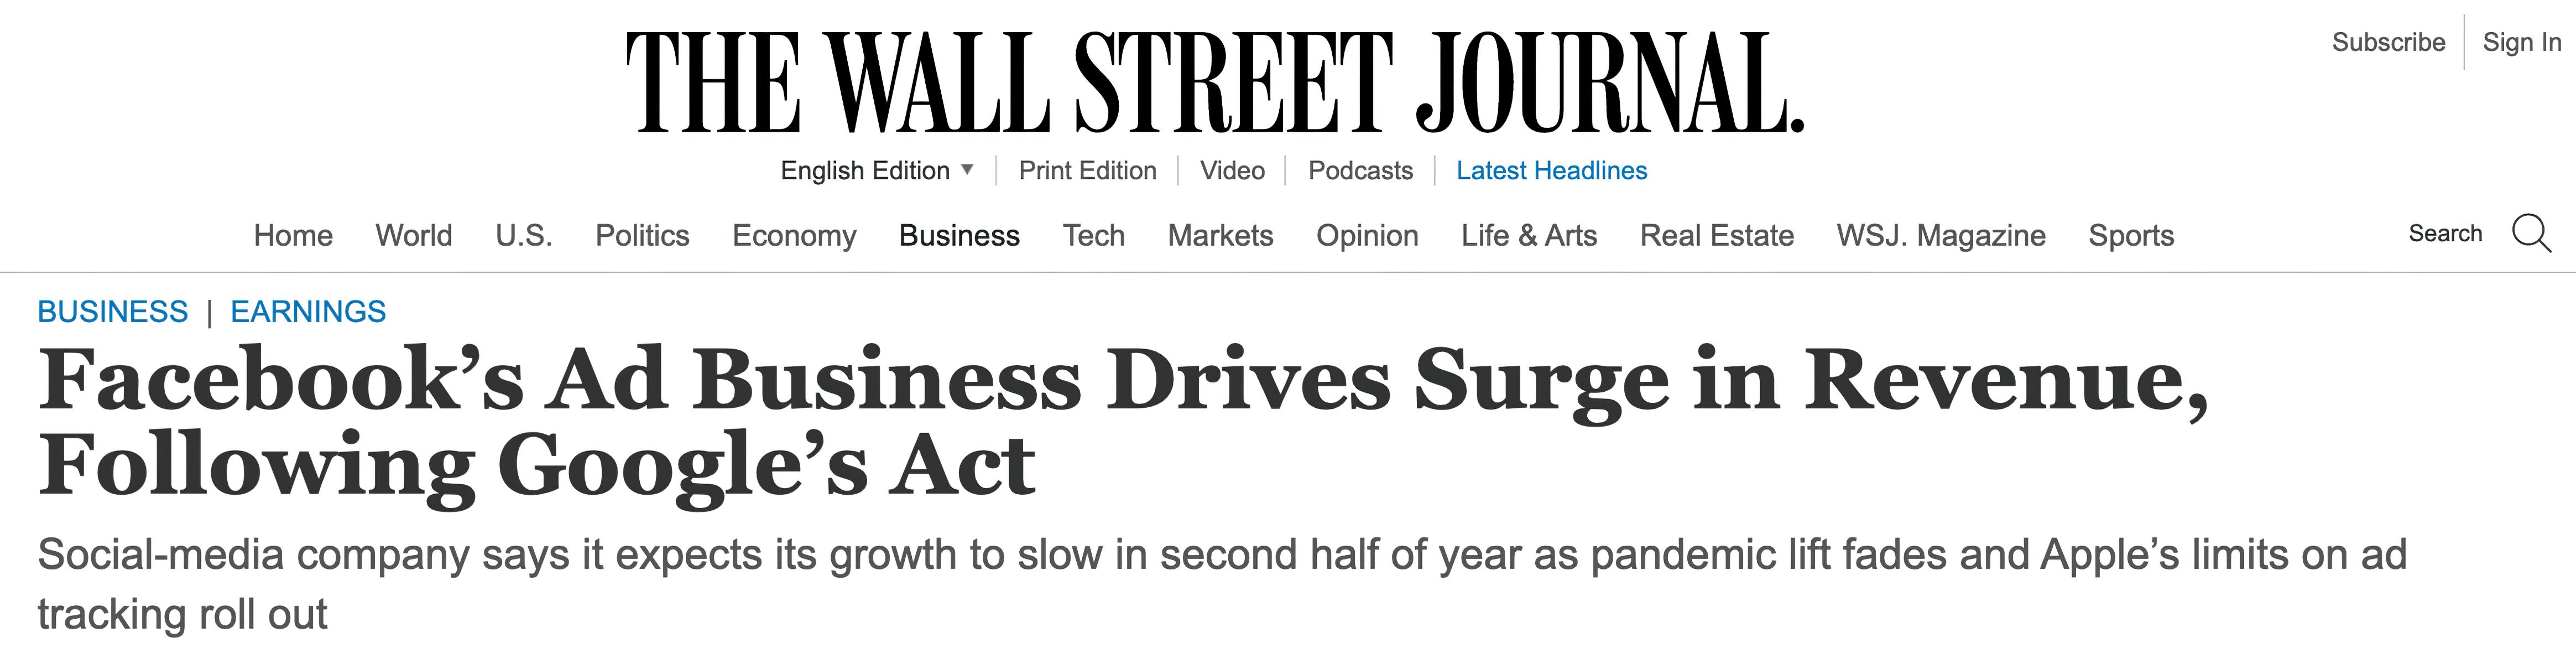 Ad Business Wall Street Journal